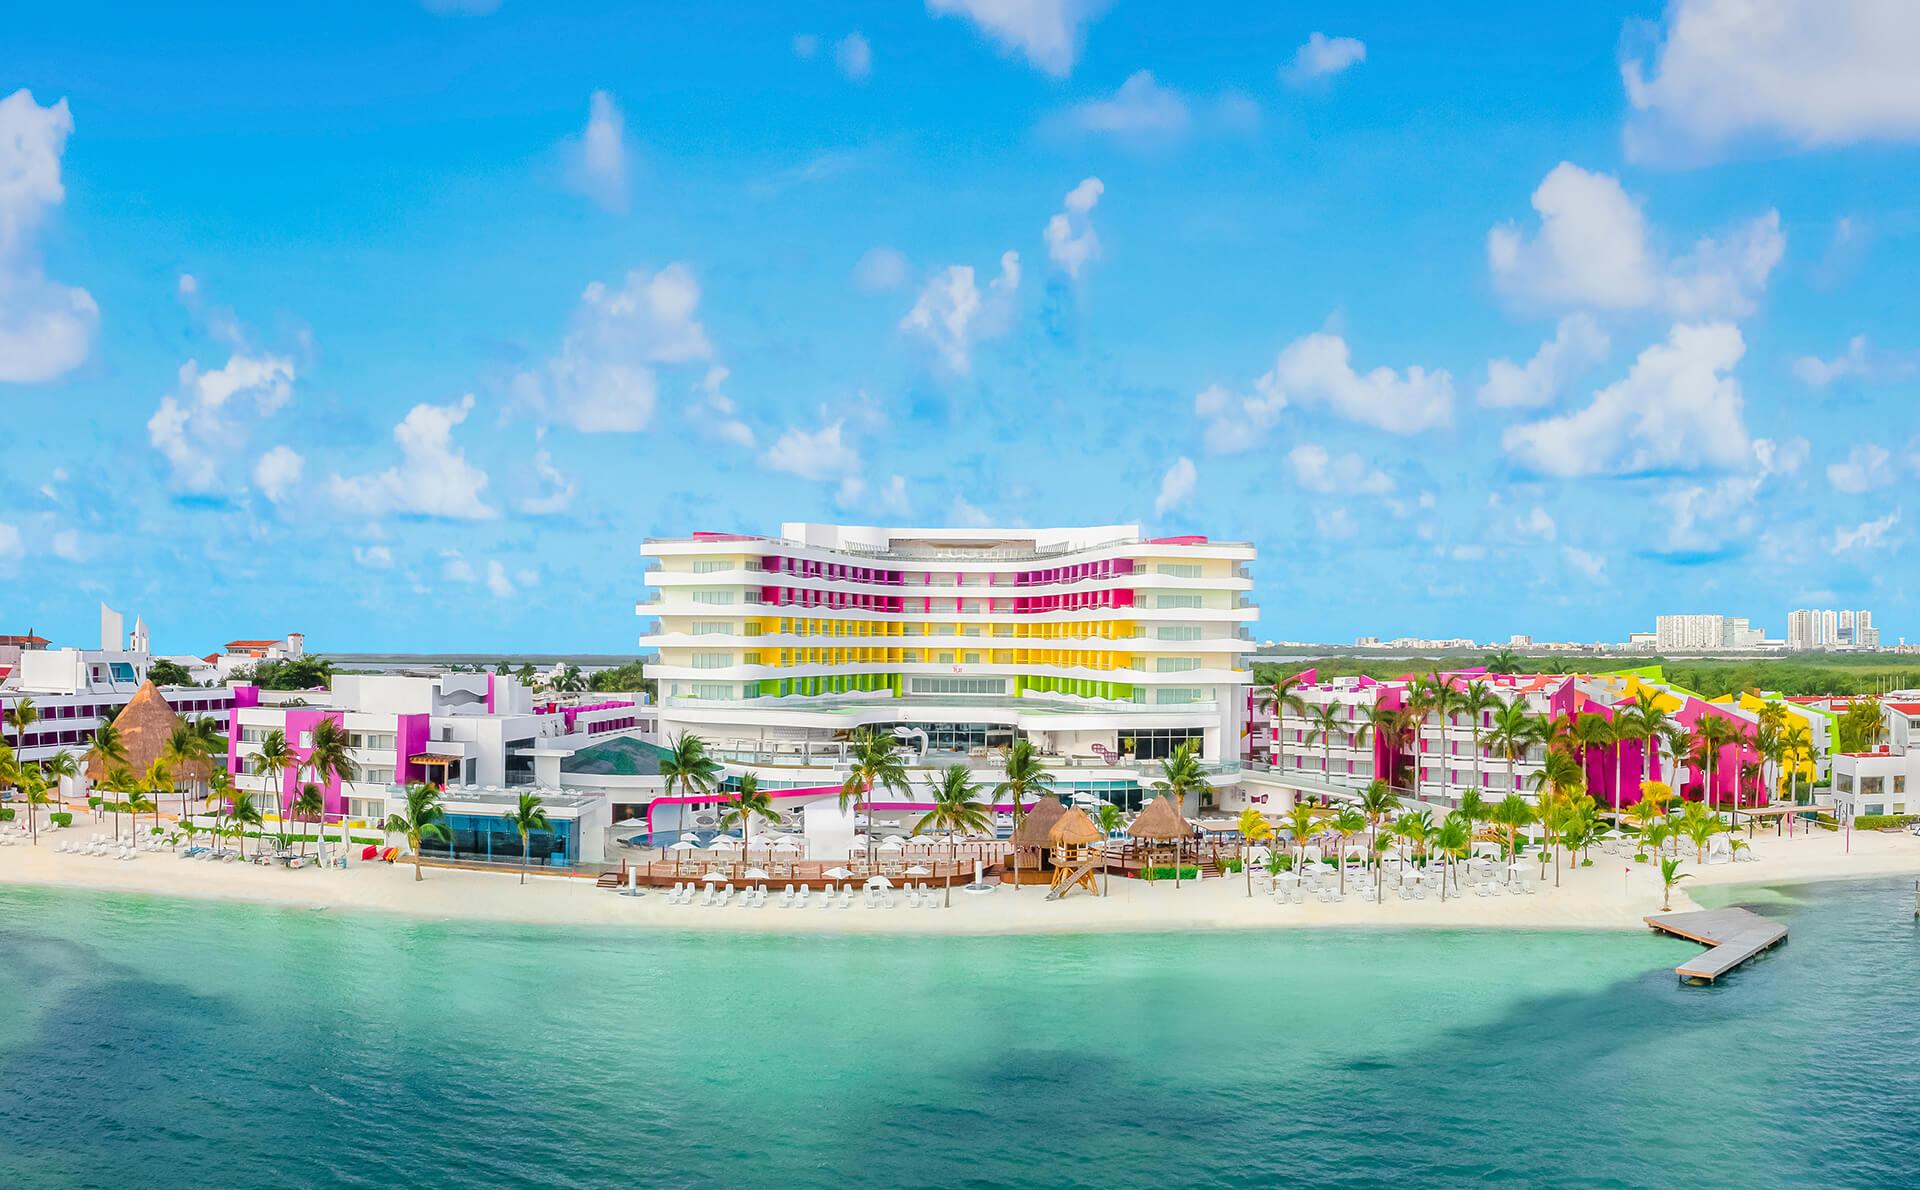 Temptation Cancun